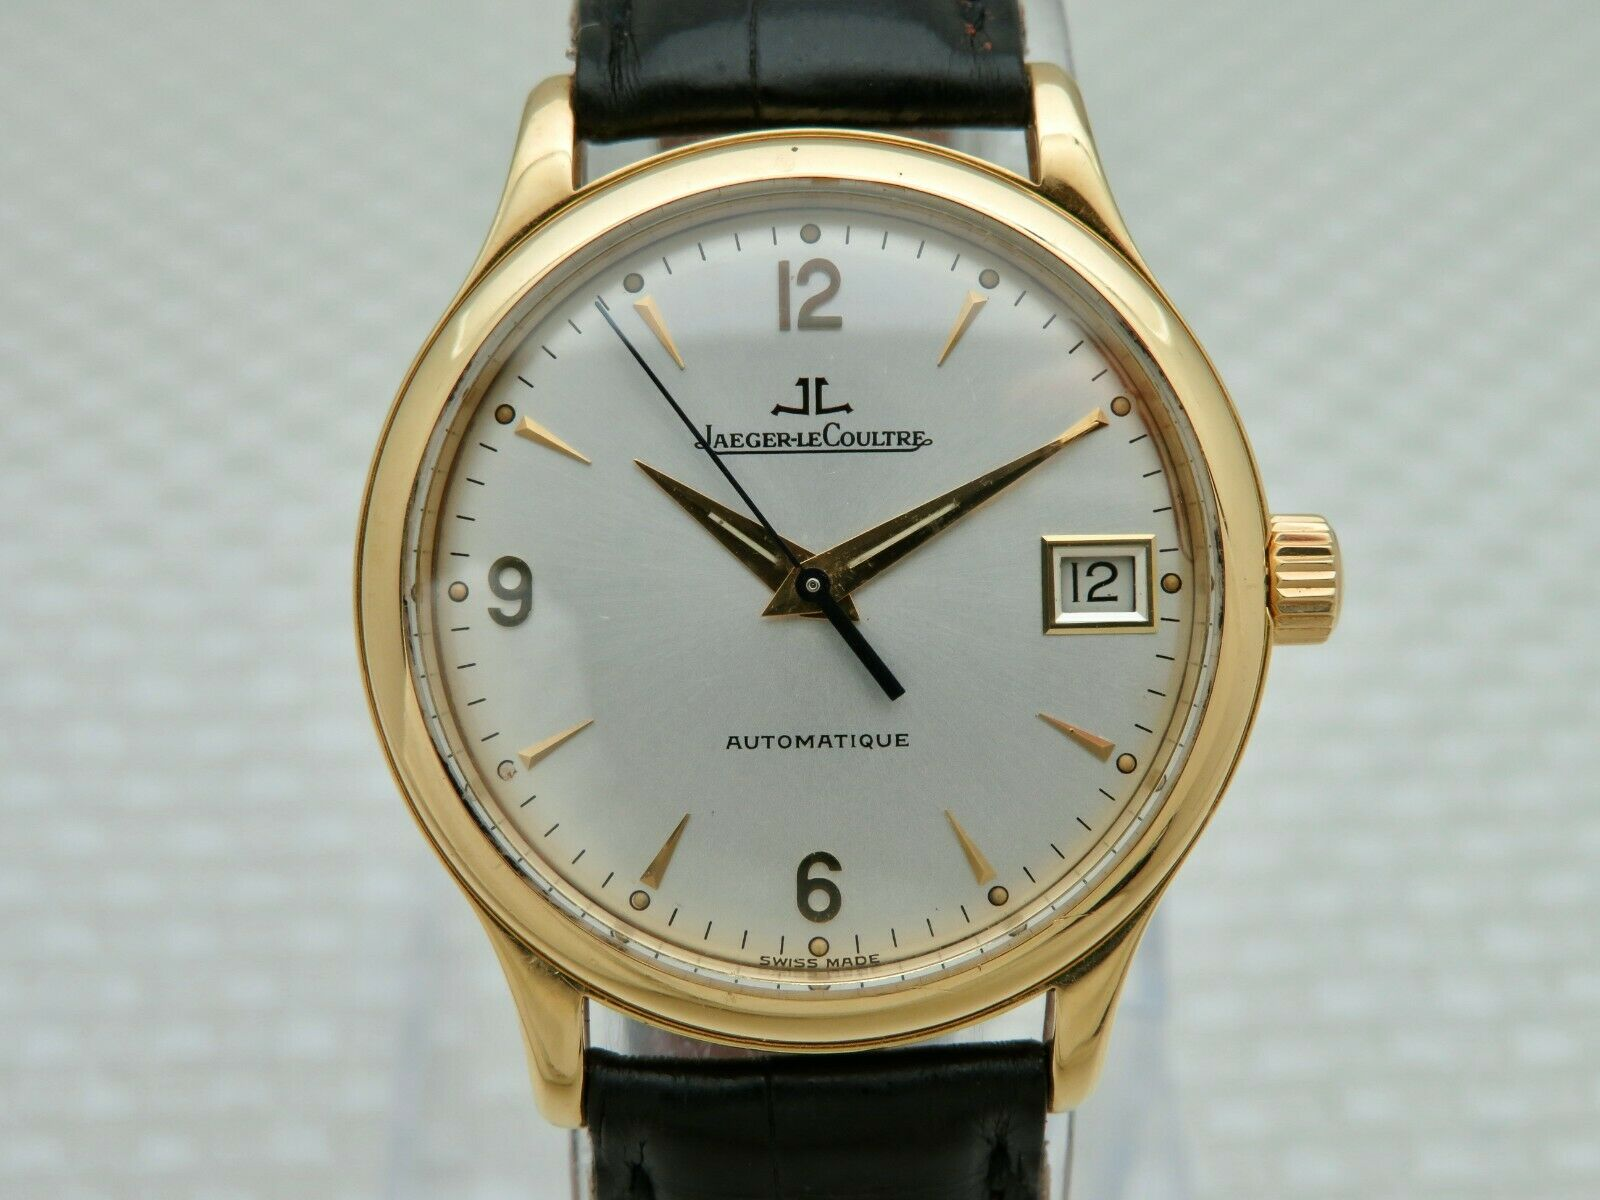 1995 Jaeger LeCoultre 18K Gold Master Control Automatique Wristwatch 145.1.89 - watch picture 1